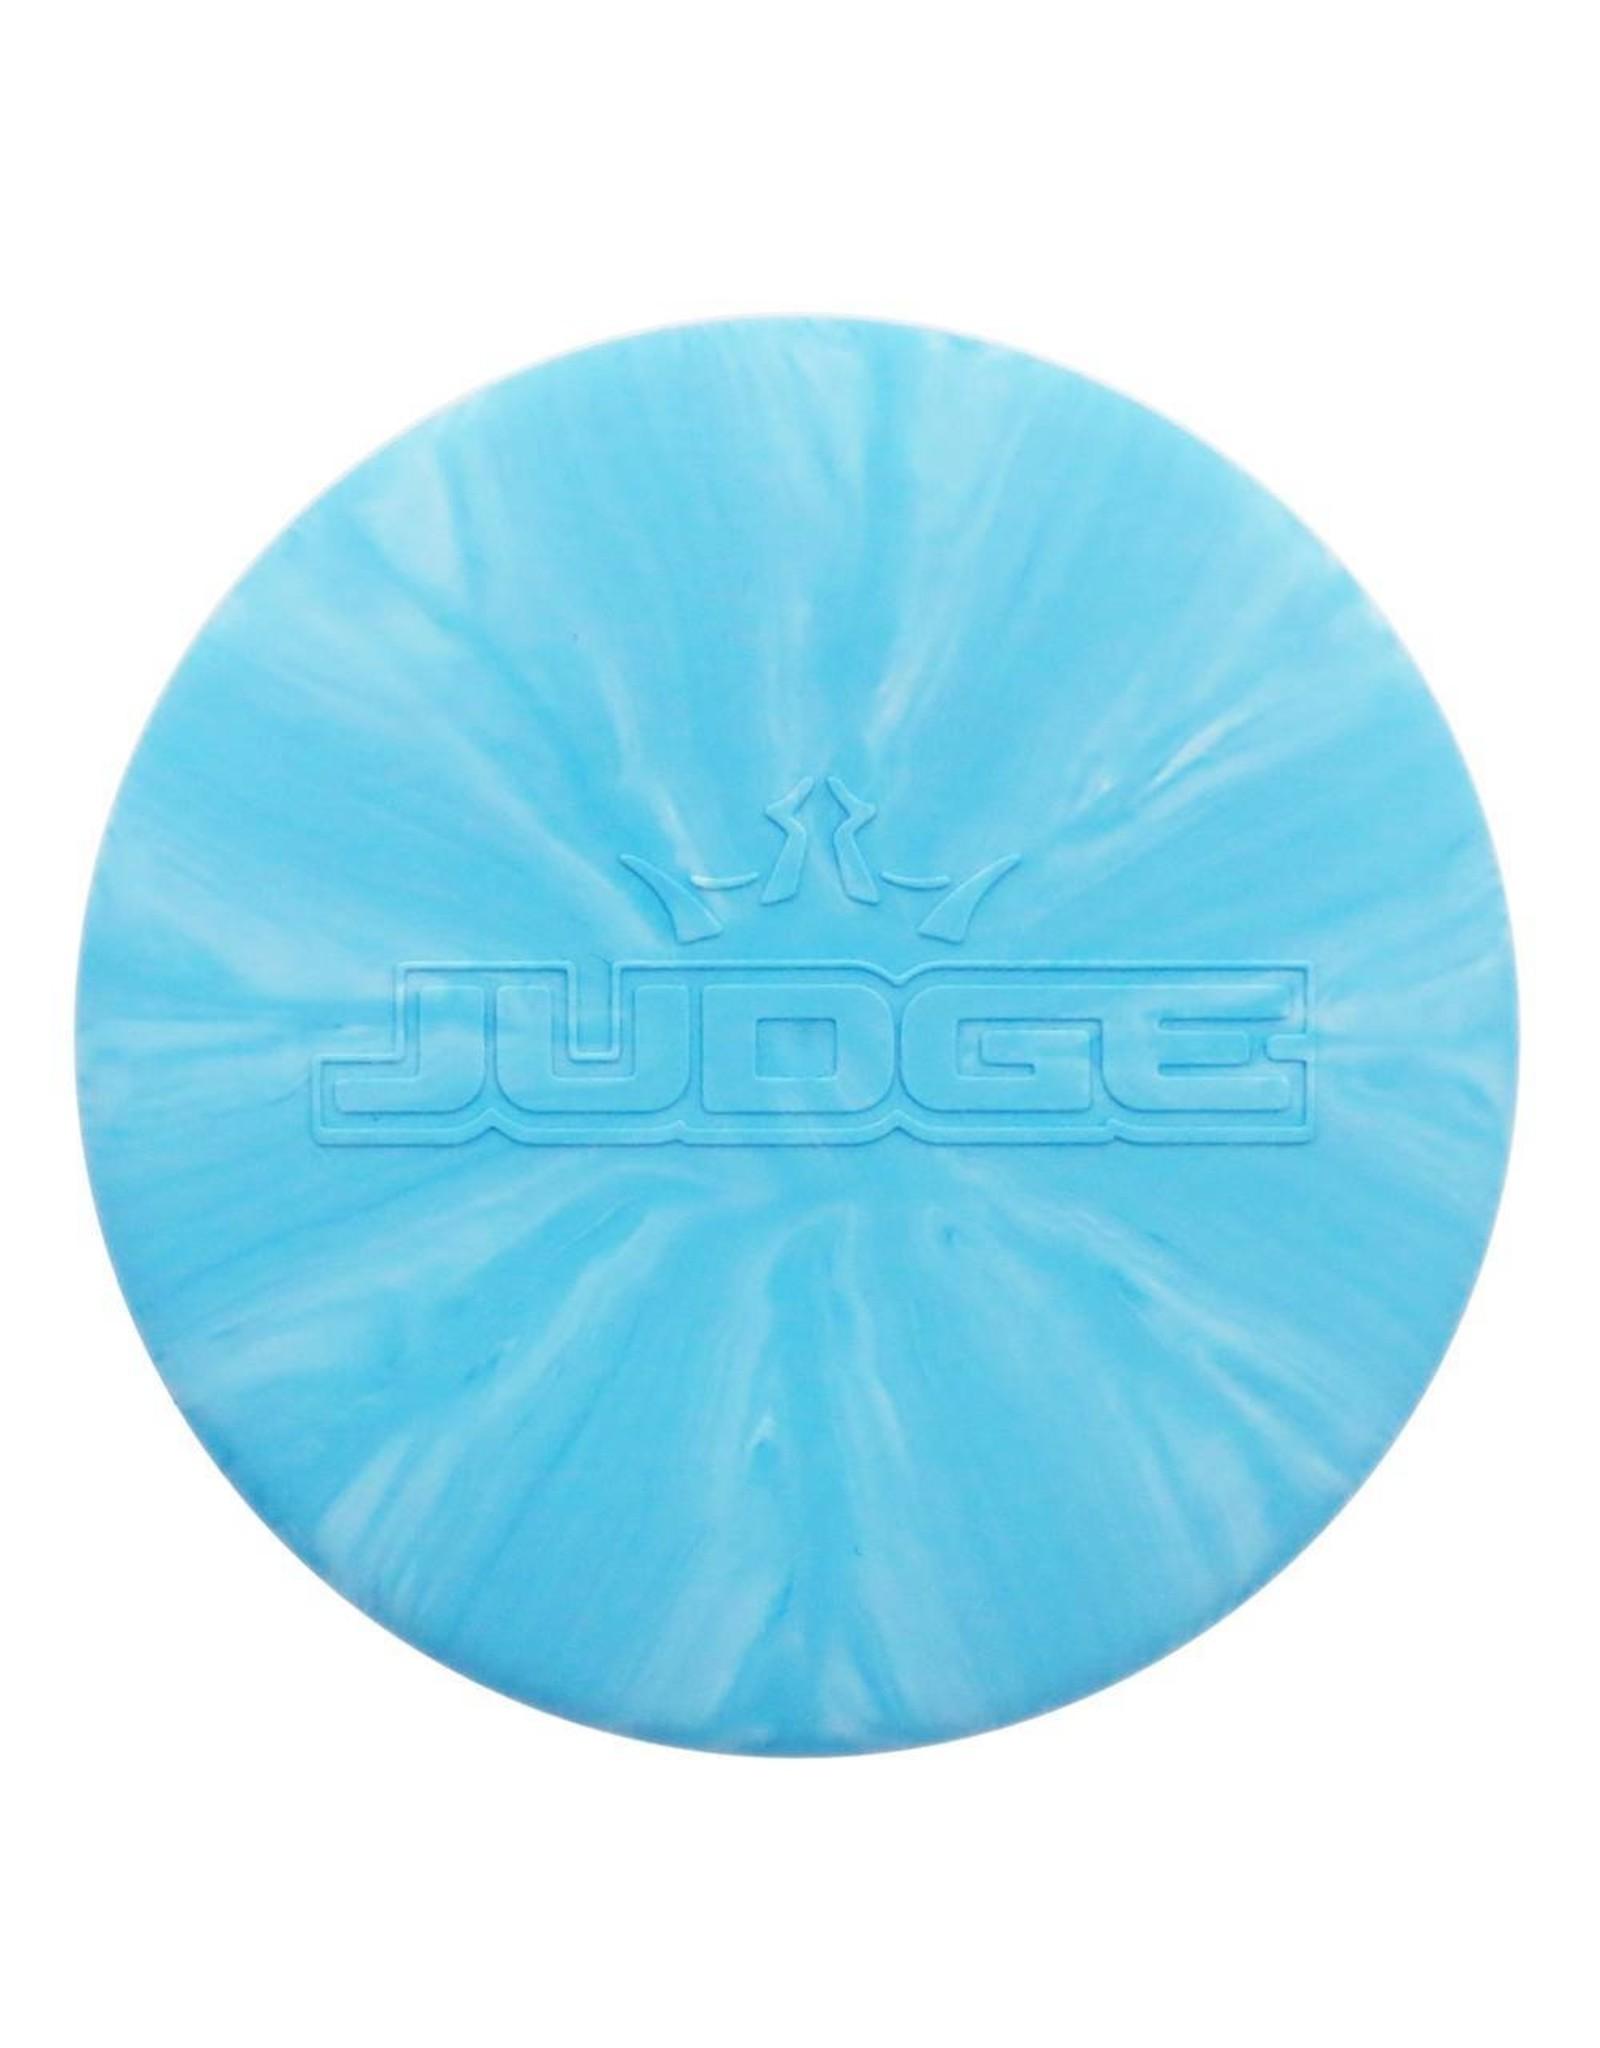 Dynamic Discs Burst Engraved Mini Judge Marker